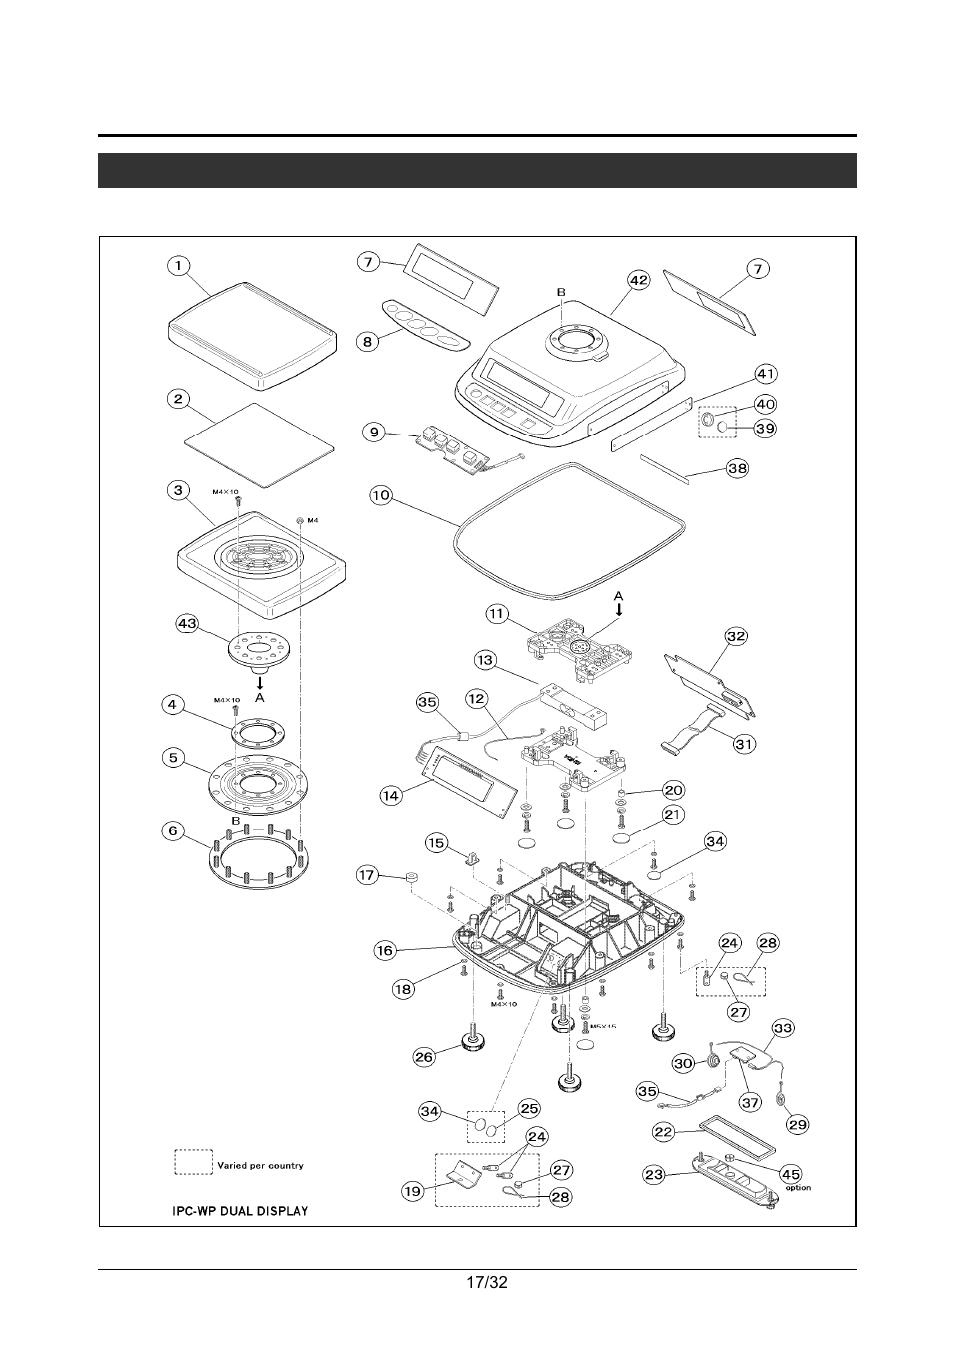 Chapter 3 hardware configuration | Rice Lake Ishida iPC-WP Portable Bench Scales  User Manual